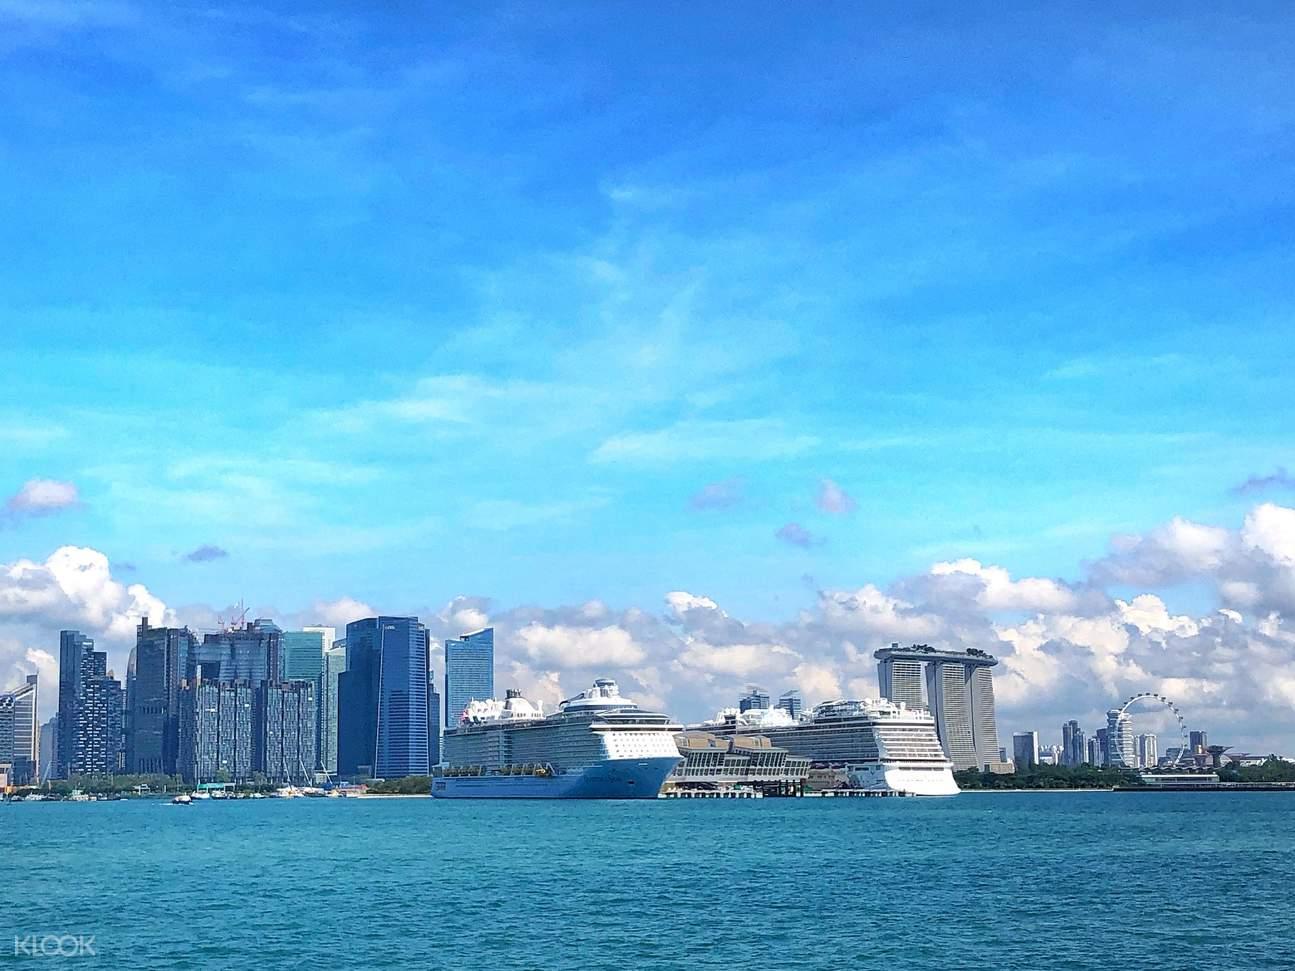 Grab your sense of adventure and cruise along Marina South Coast